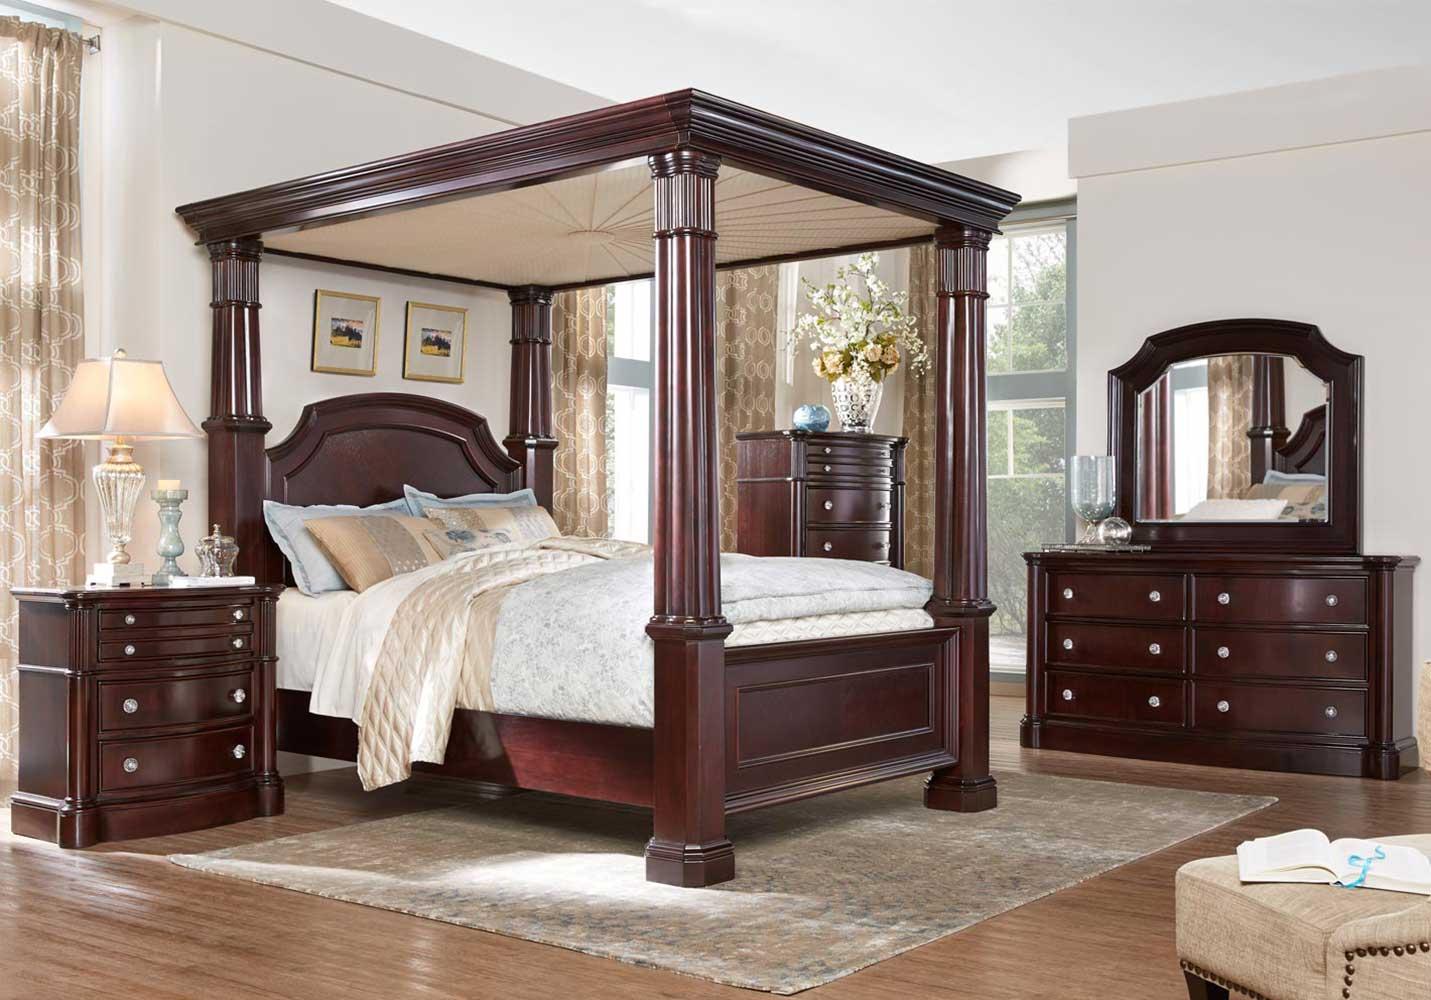 Canopy · Panel Bedroom & Bedroom Sets